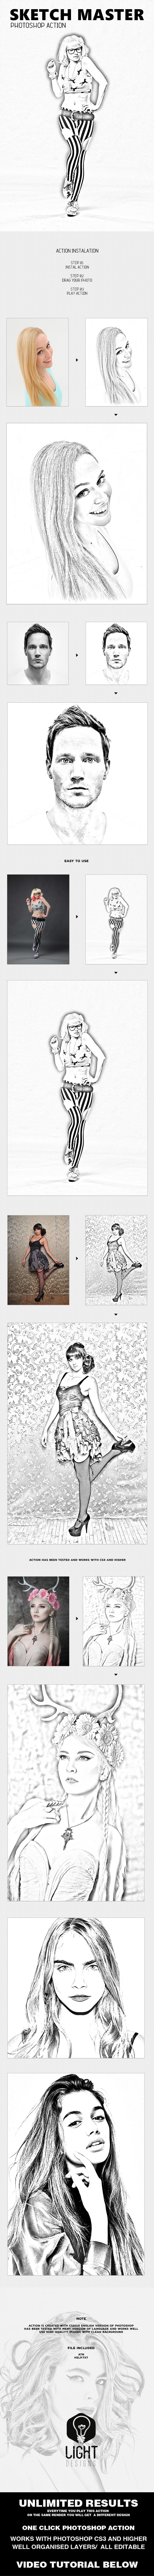 Sketch Master - Photoshop Action 15970140